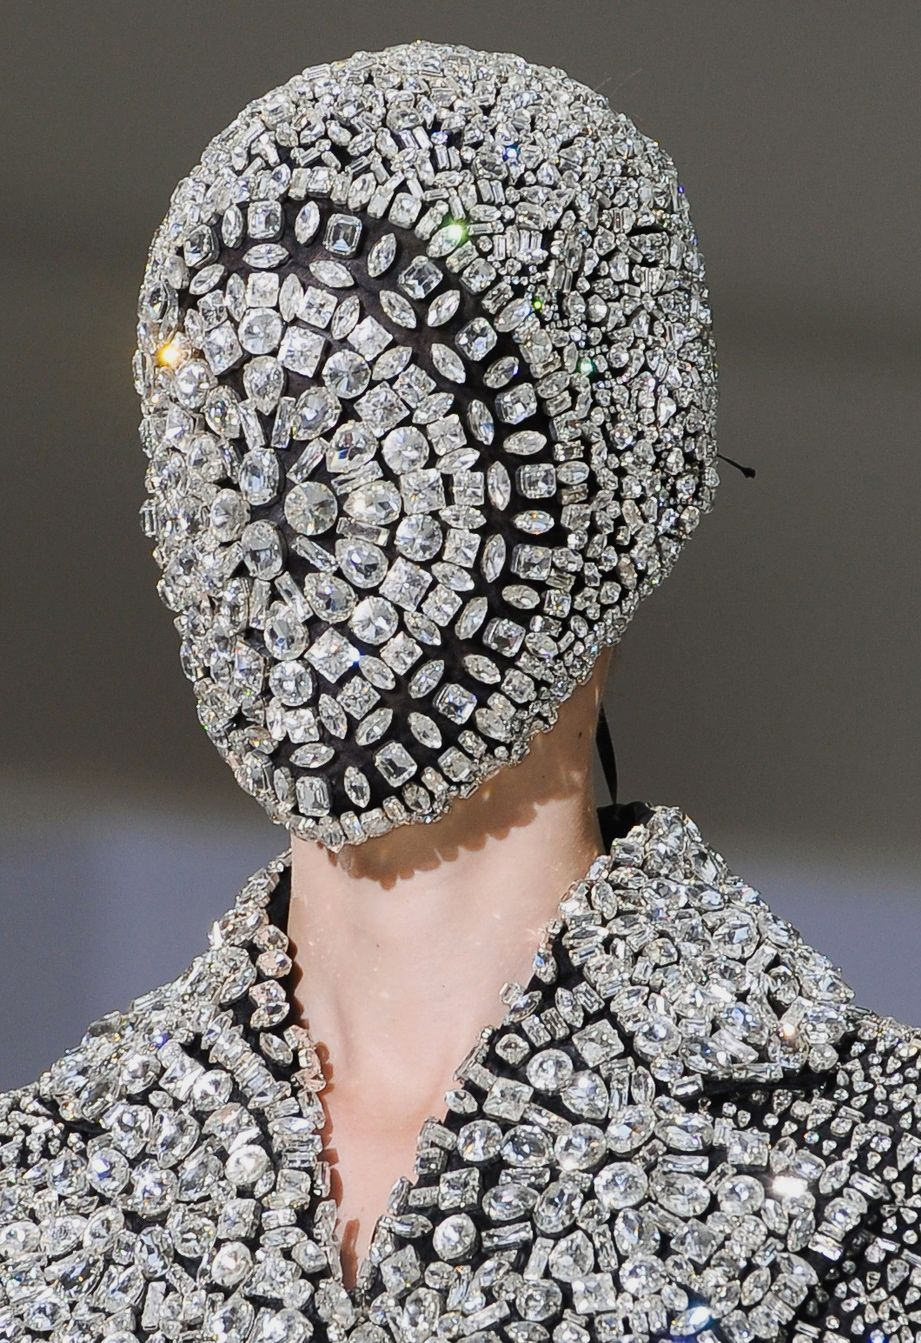 74768b675 Diamond Mask ›†› Maison Martin Margiela ›†› #fashion #avantgarde #diamond # mask #haute #couture #dark #sparkle #innovative #directional #fashion